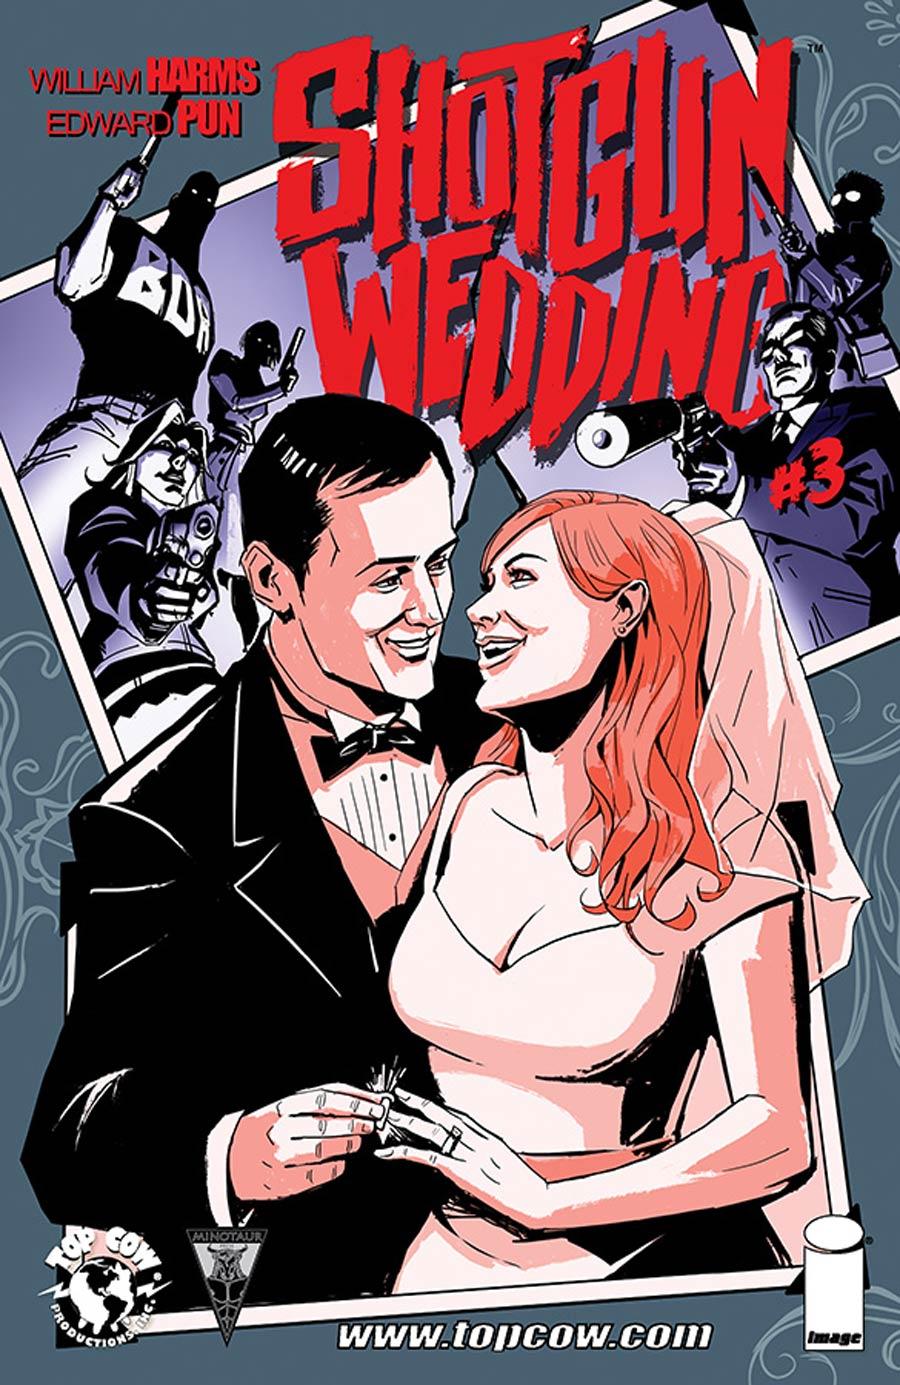 Shotgun Wedding #3